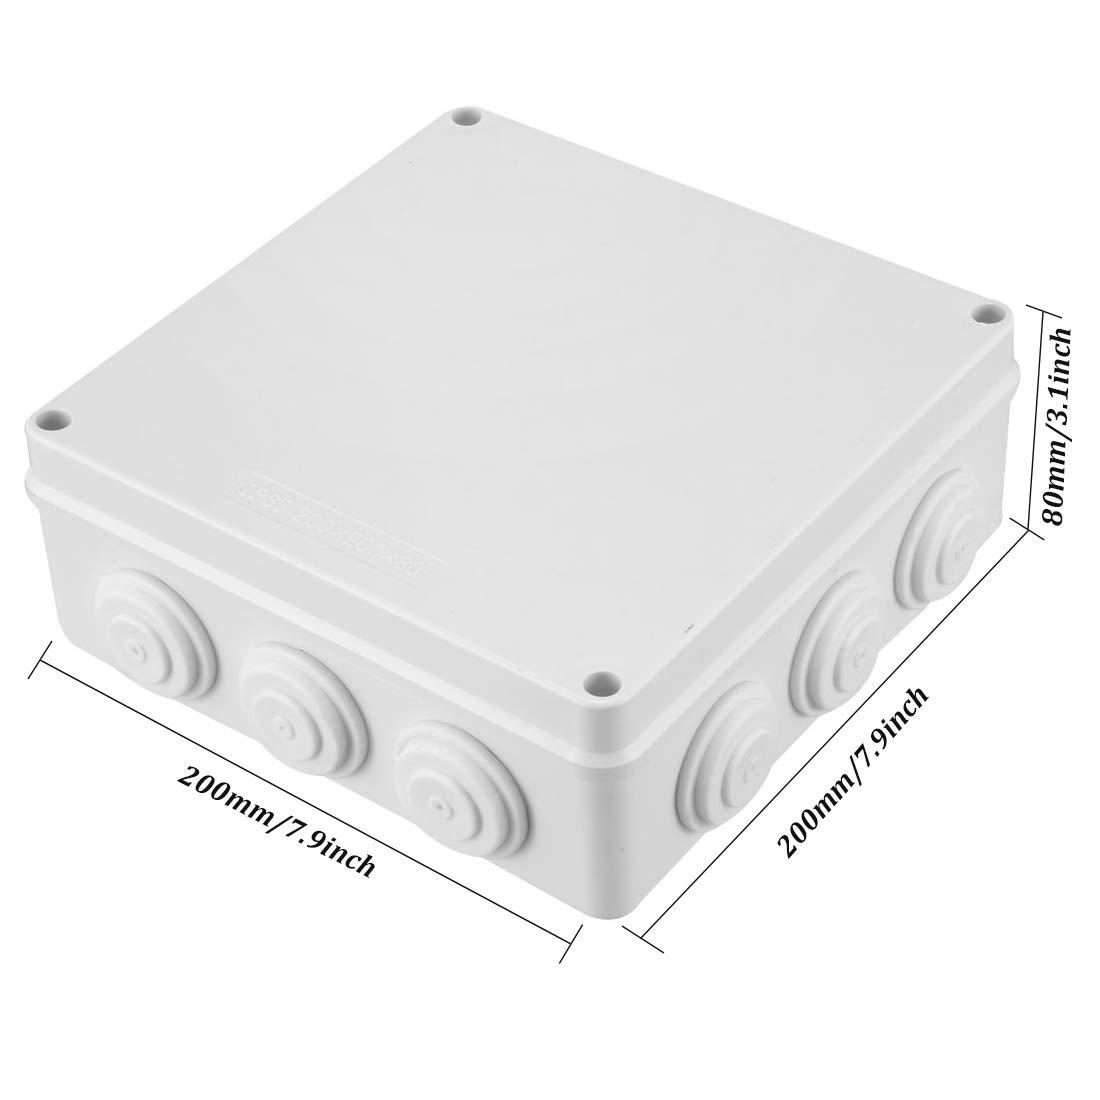 Waterproof Dustproof ABS Plastic Junction Box Universal Electric Project